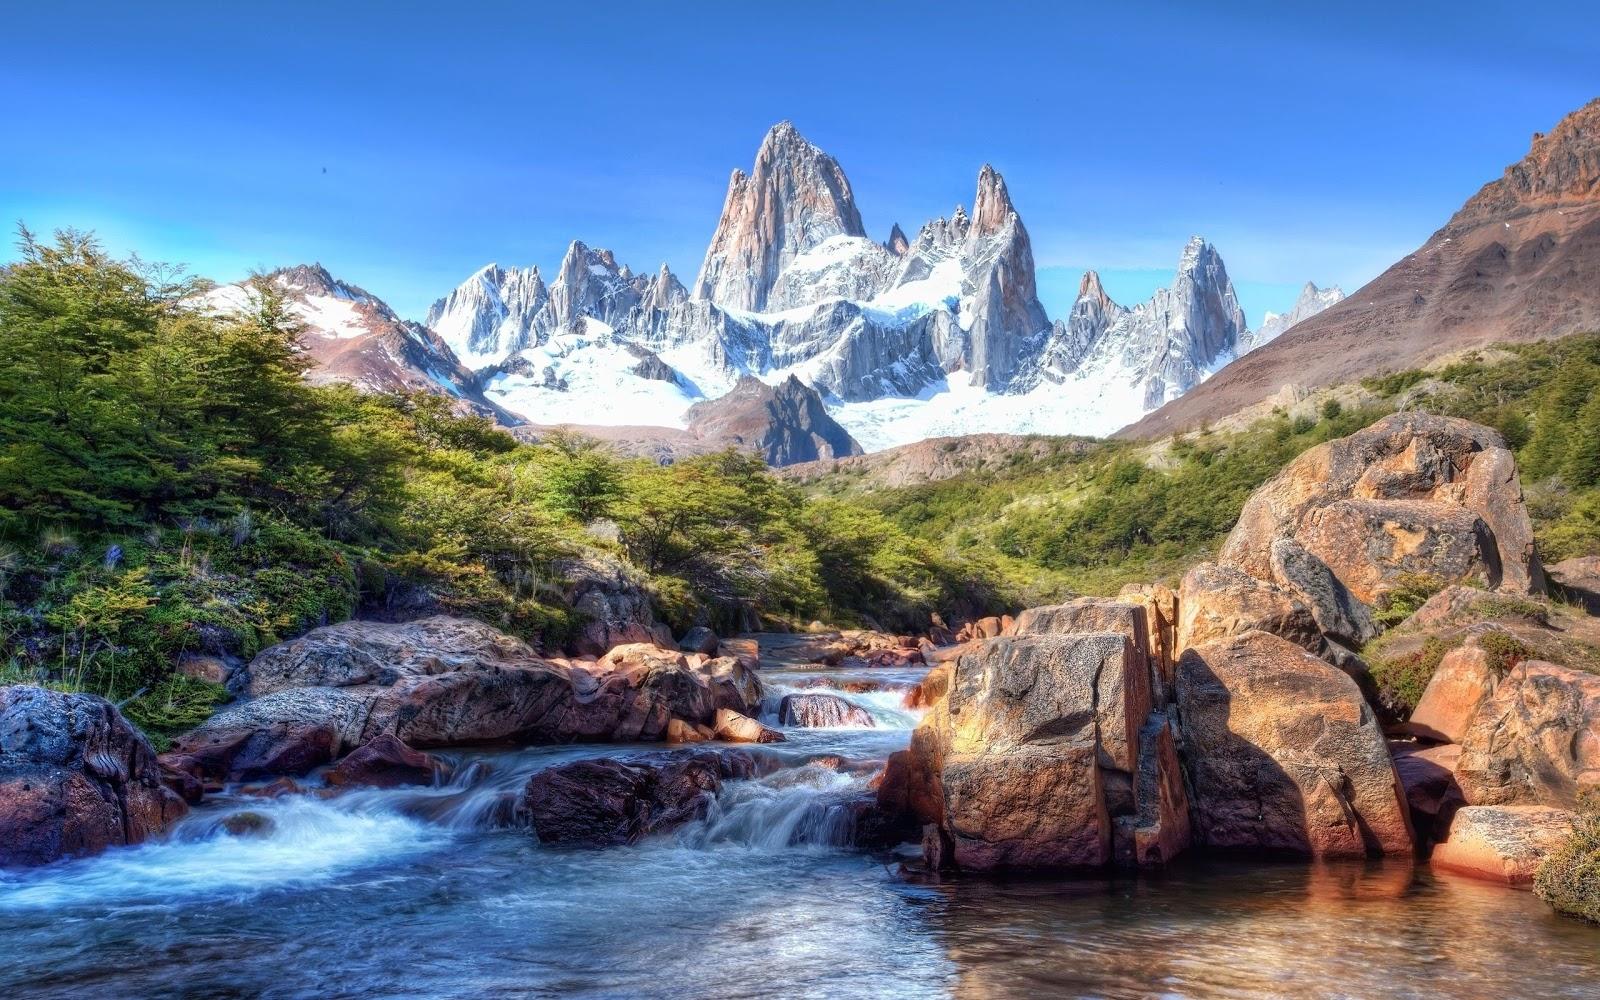 Download beautiful mountain top sunset wallpaper hd wallpaper - Desktop Backgrounds Mountains Wallpapersafari